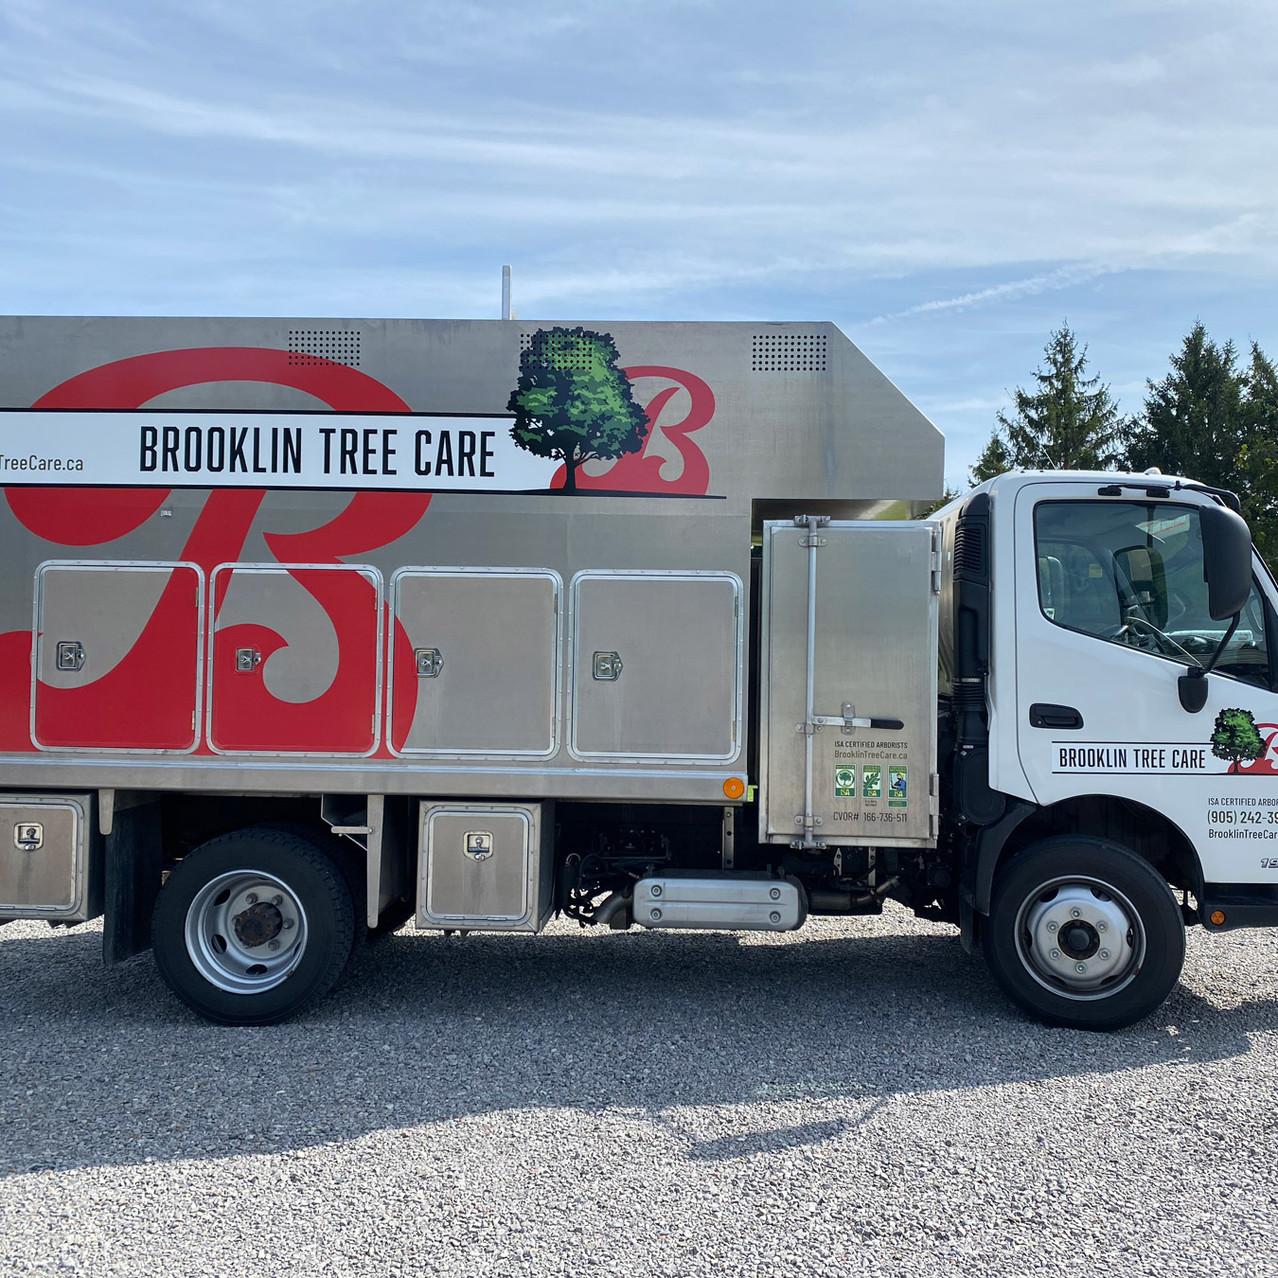 BTC-Truck-Chipper-Oct-2020-IMG_6908.jpg